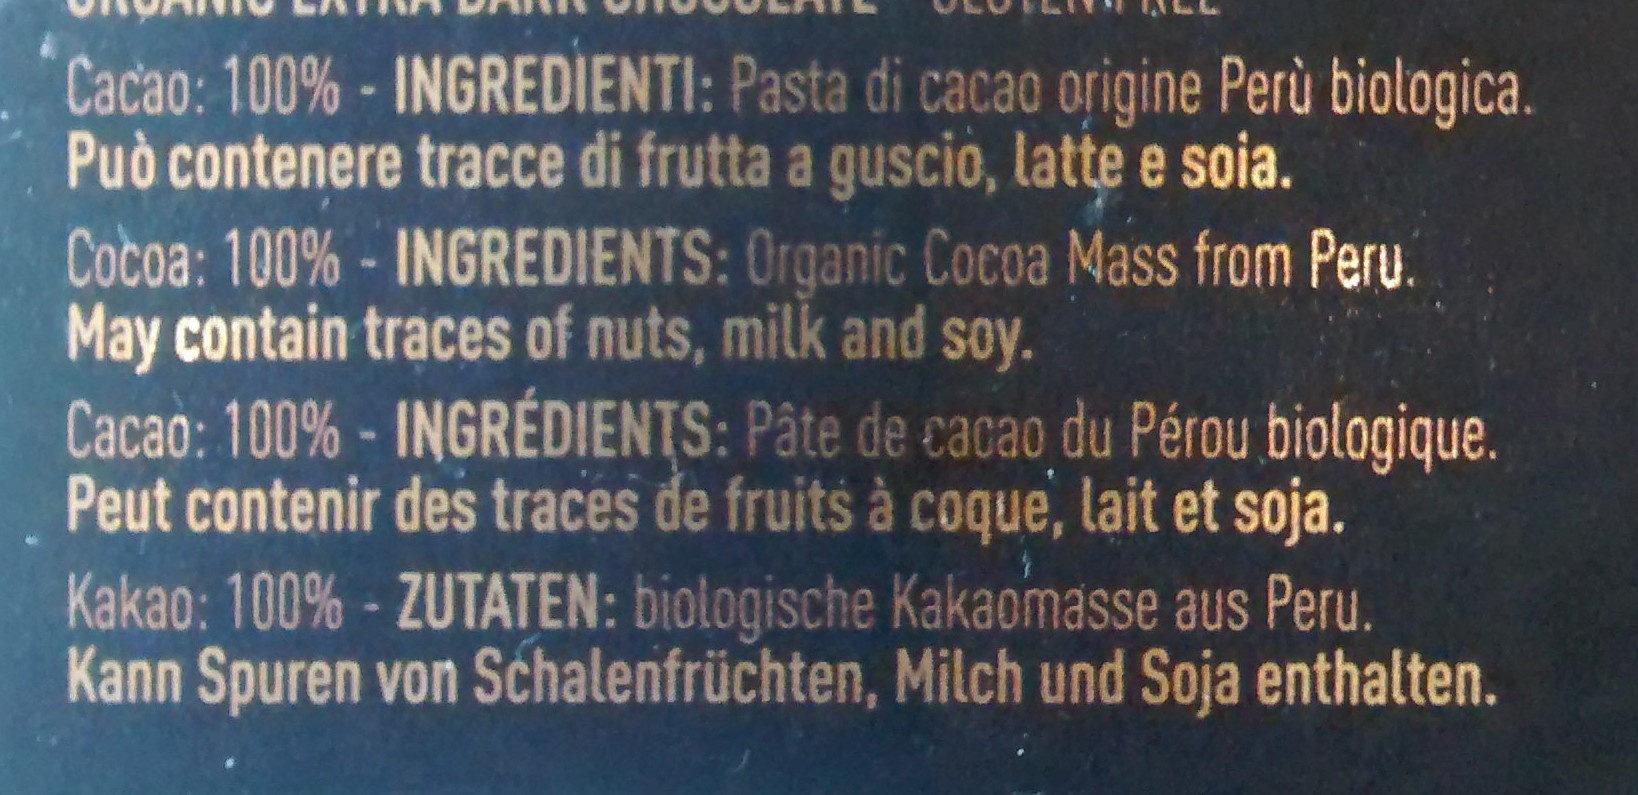 Tablette chocolat - Ingredients - it